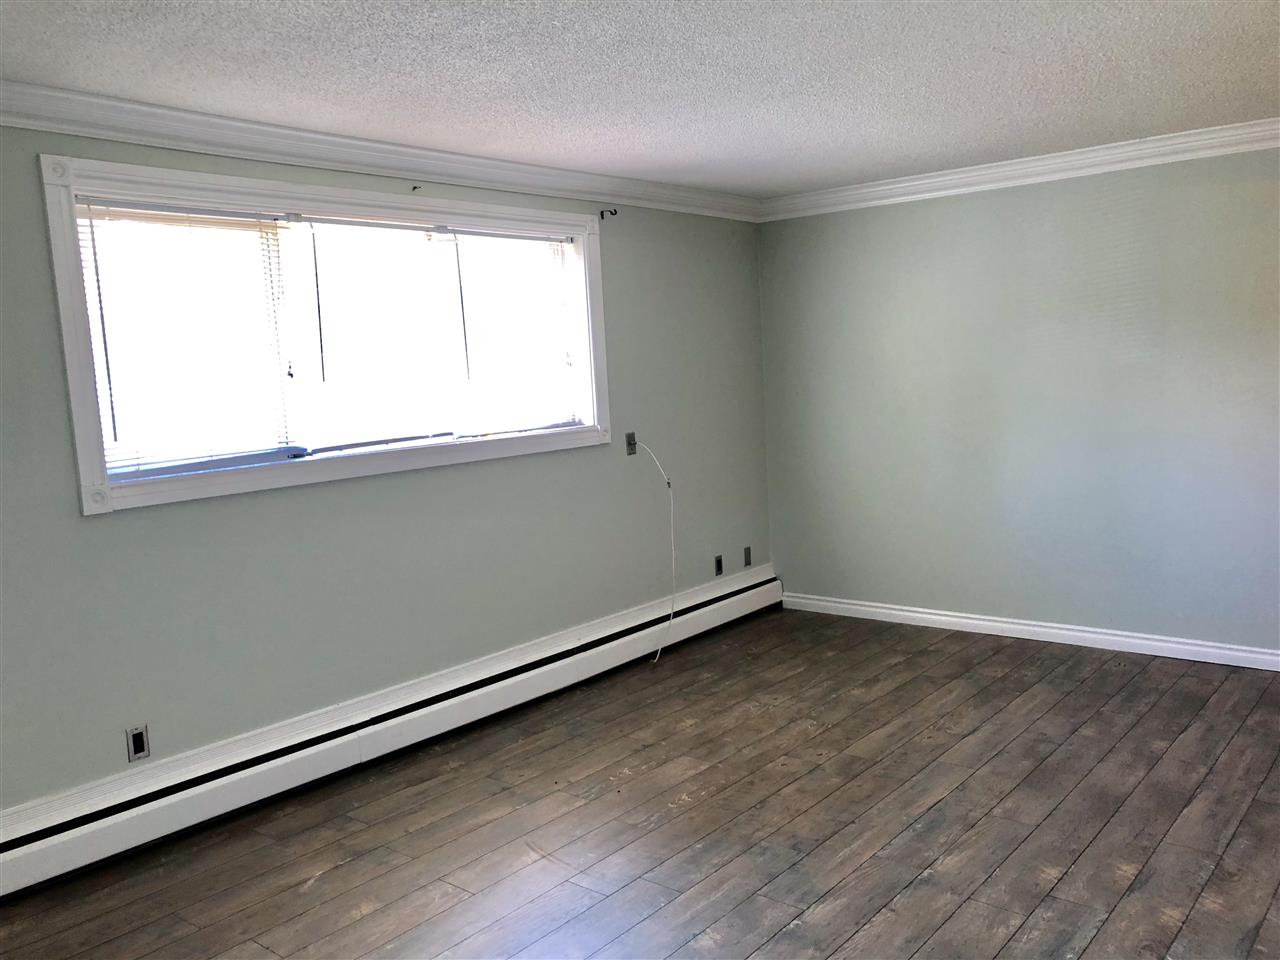 Buliding: 6307 118 Avenue, Edmonton, AB